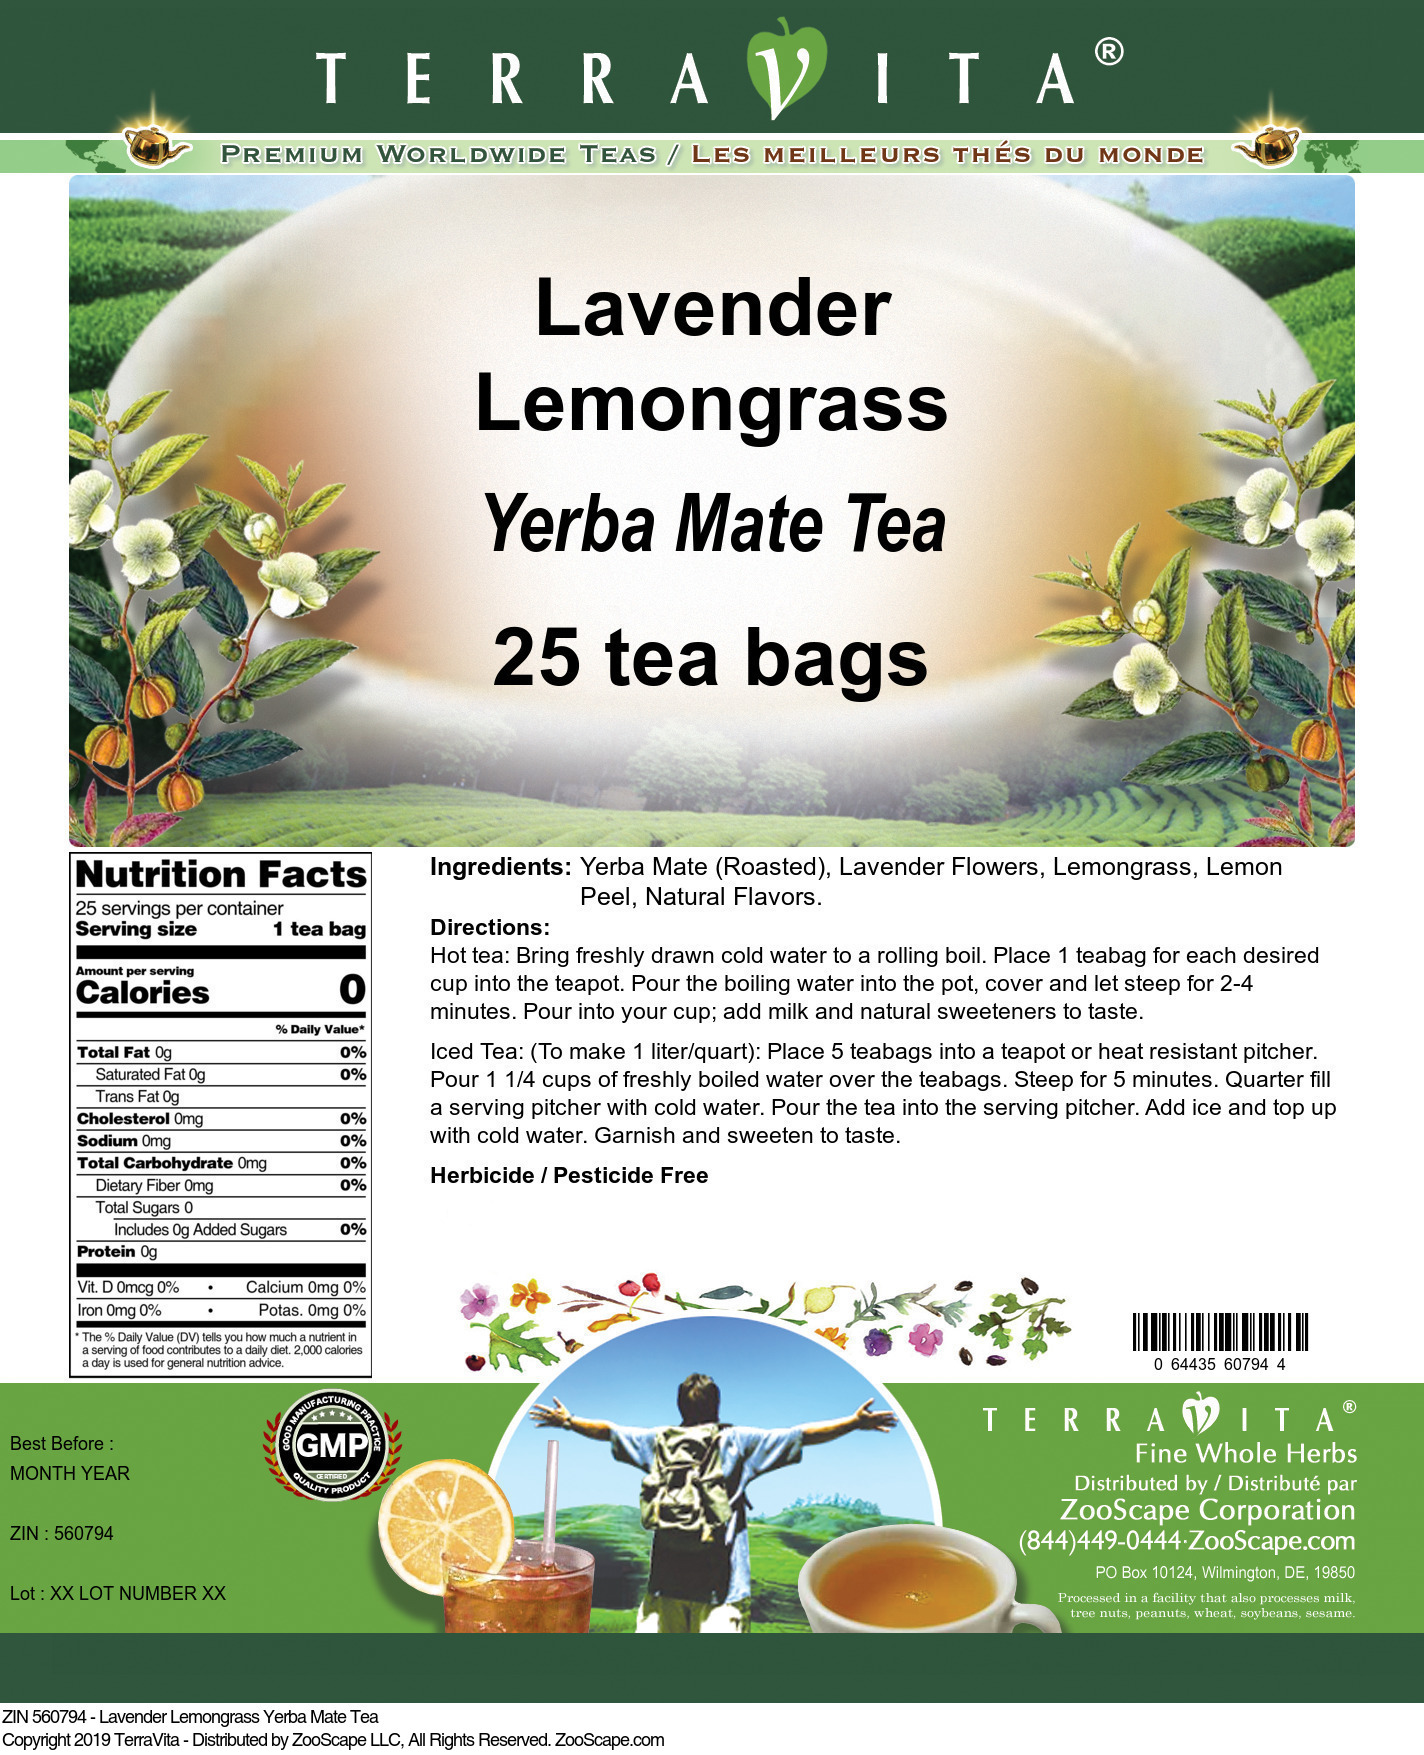 Lavender Lemongrass Yerba Mate Tea